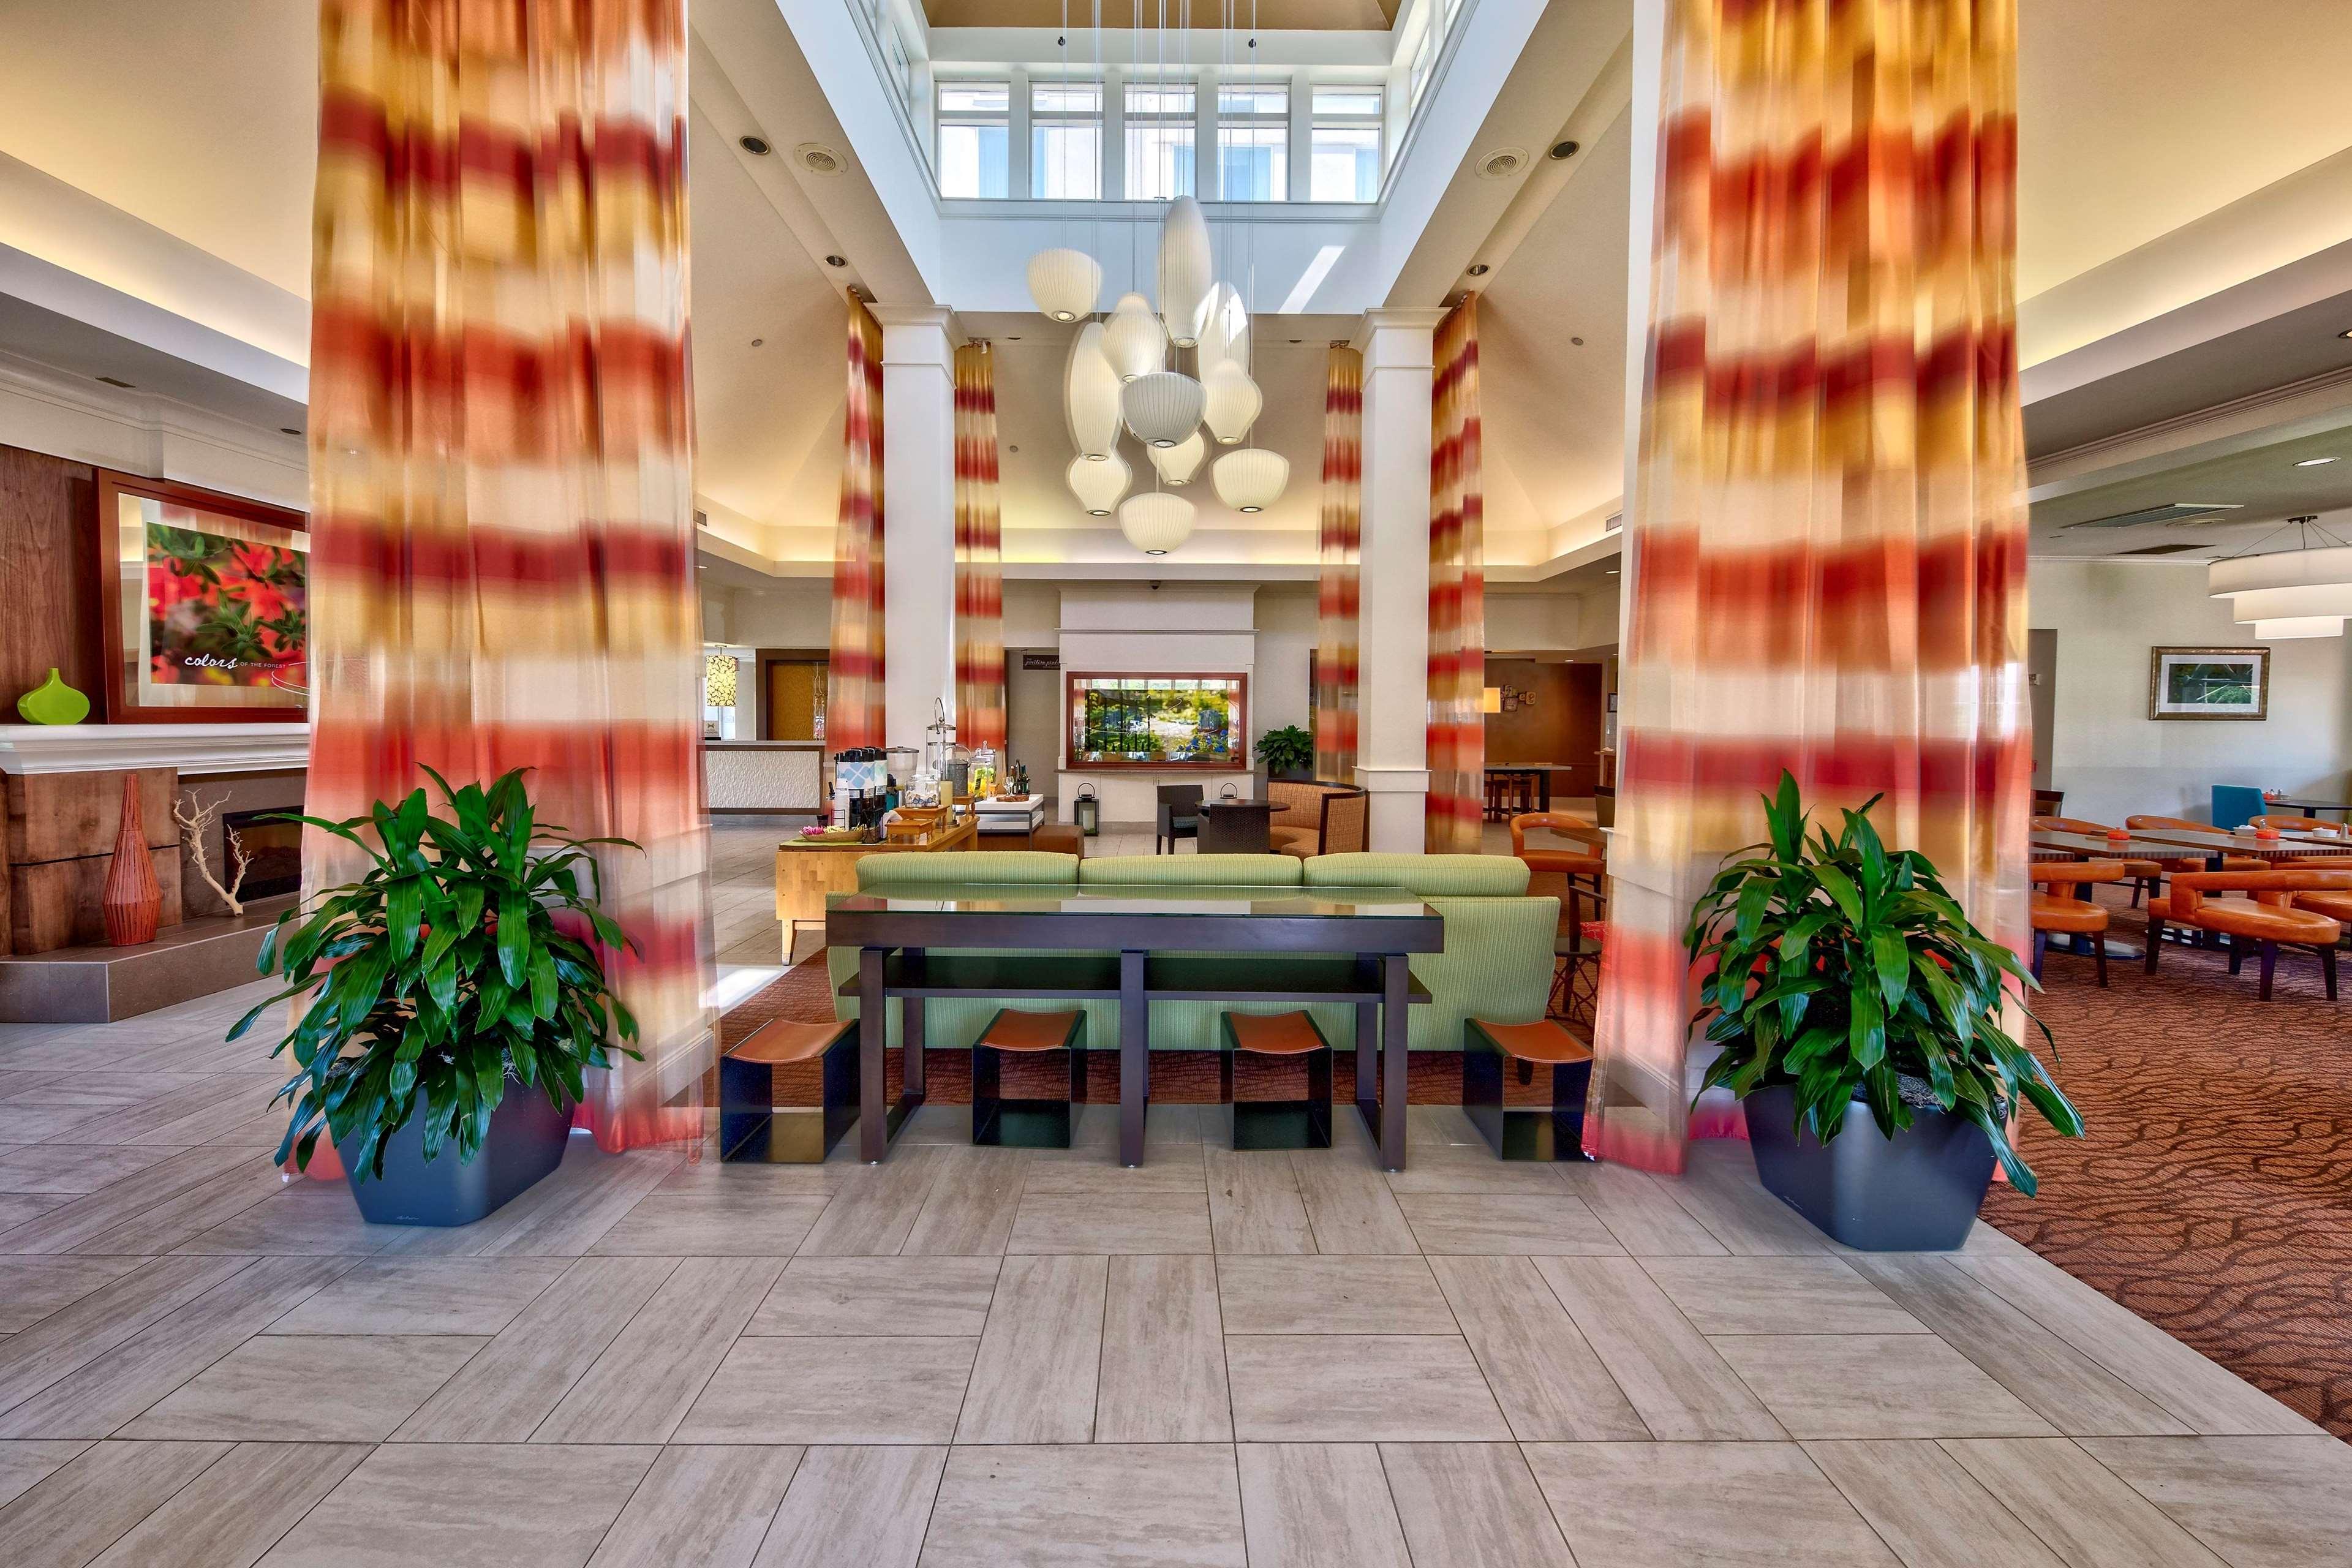 Hilton Garden Inn Houston Bush Intercontinental Airport Houston Texas Tx